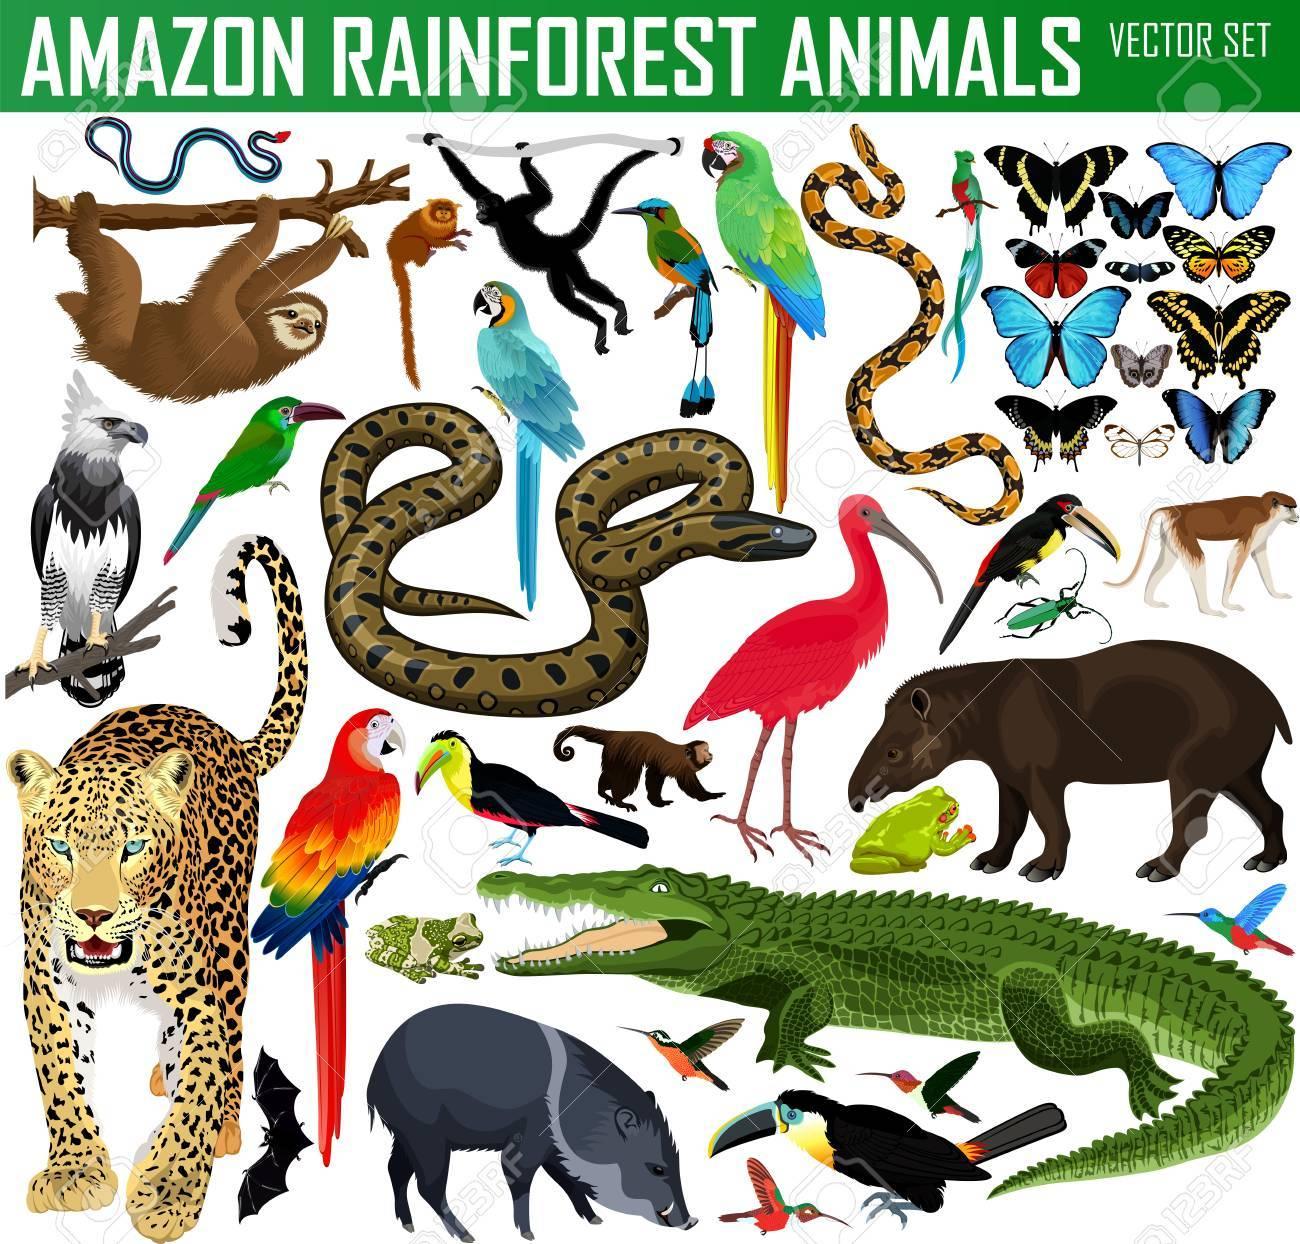 big set of vector amazon rainforest jungle animals - 89403895